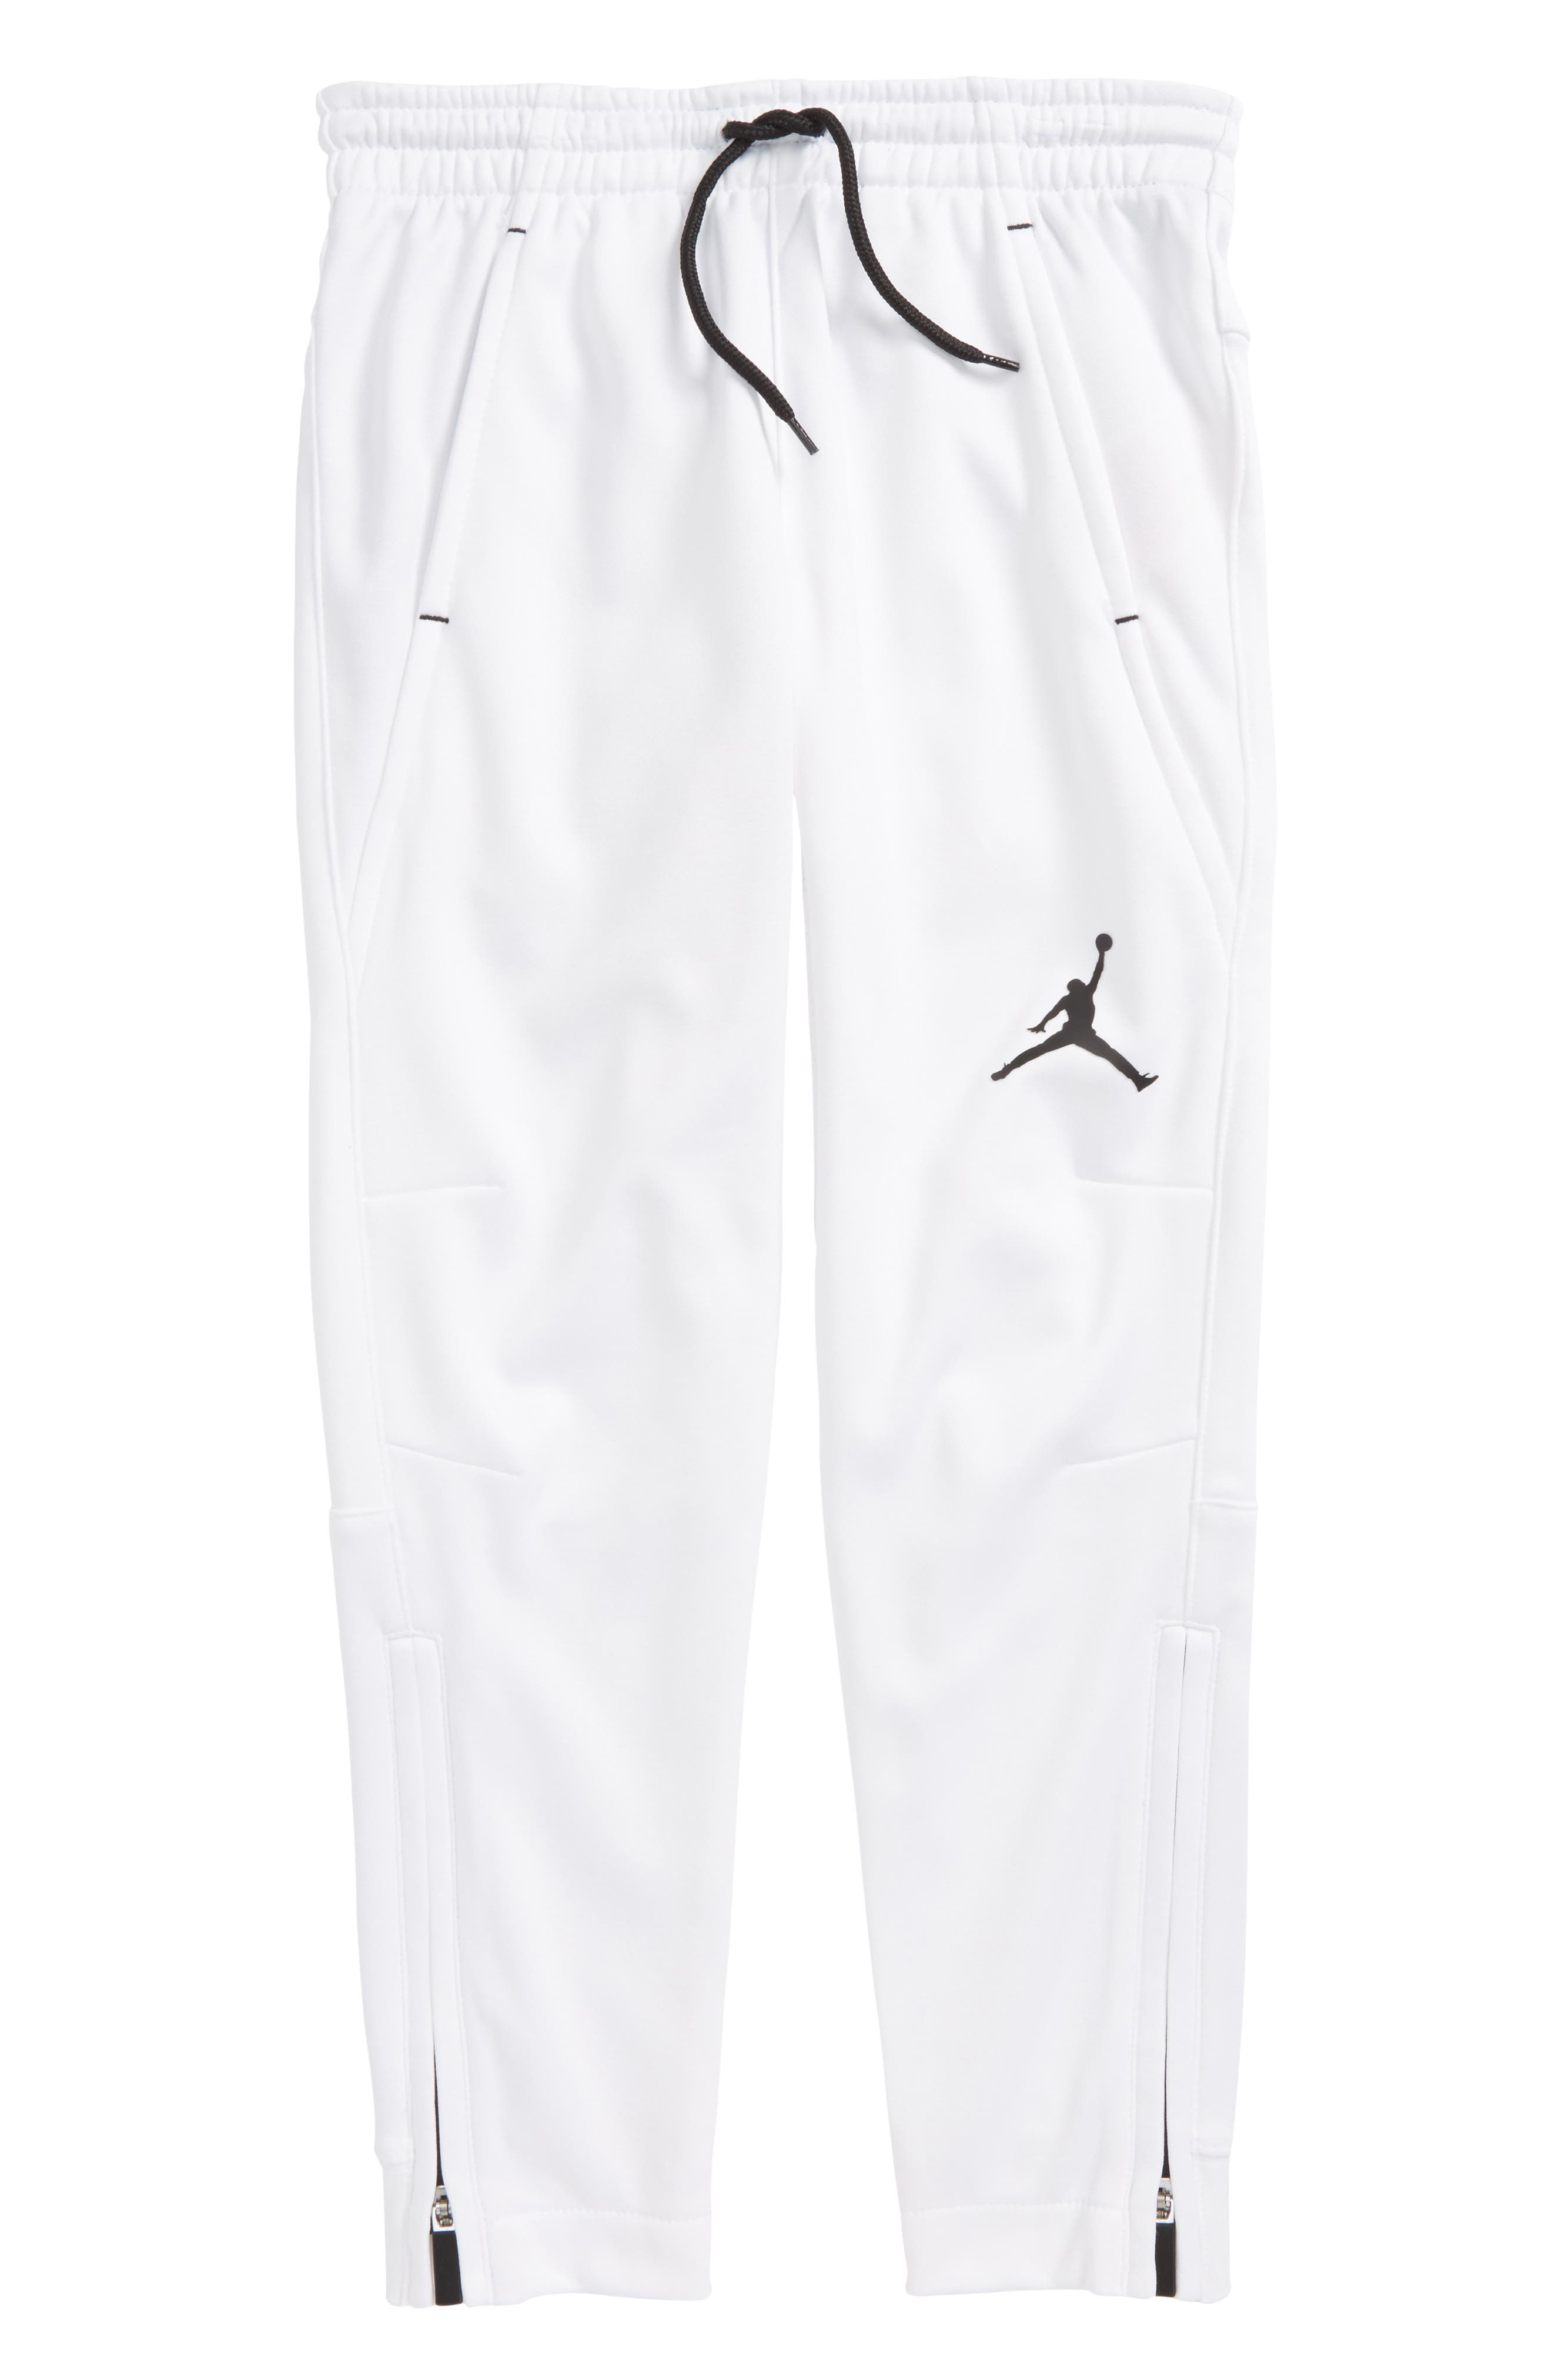 Jordan Dry 23 Alpha FZ Therma-FIT Sweatpants,                         Main,                         color, White